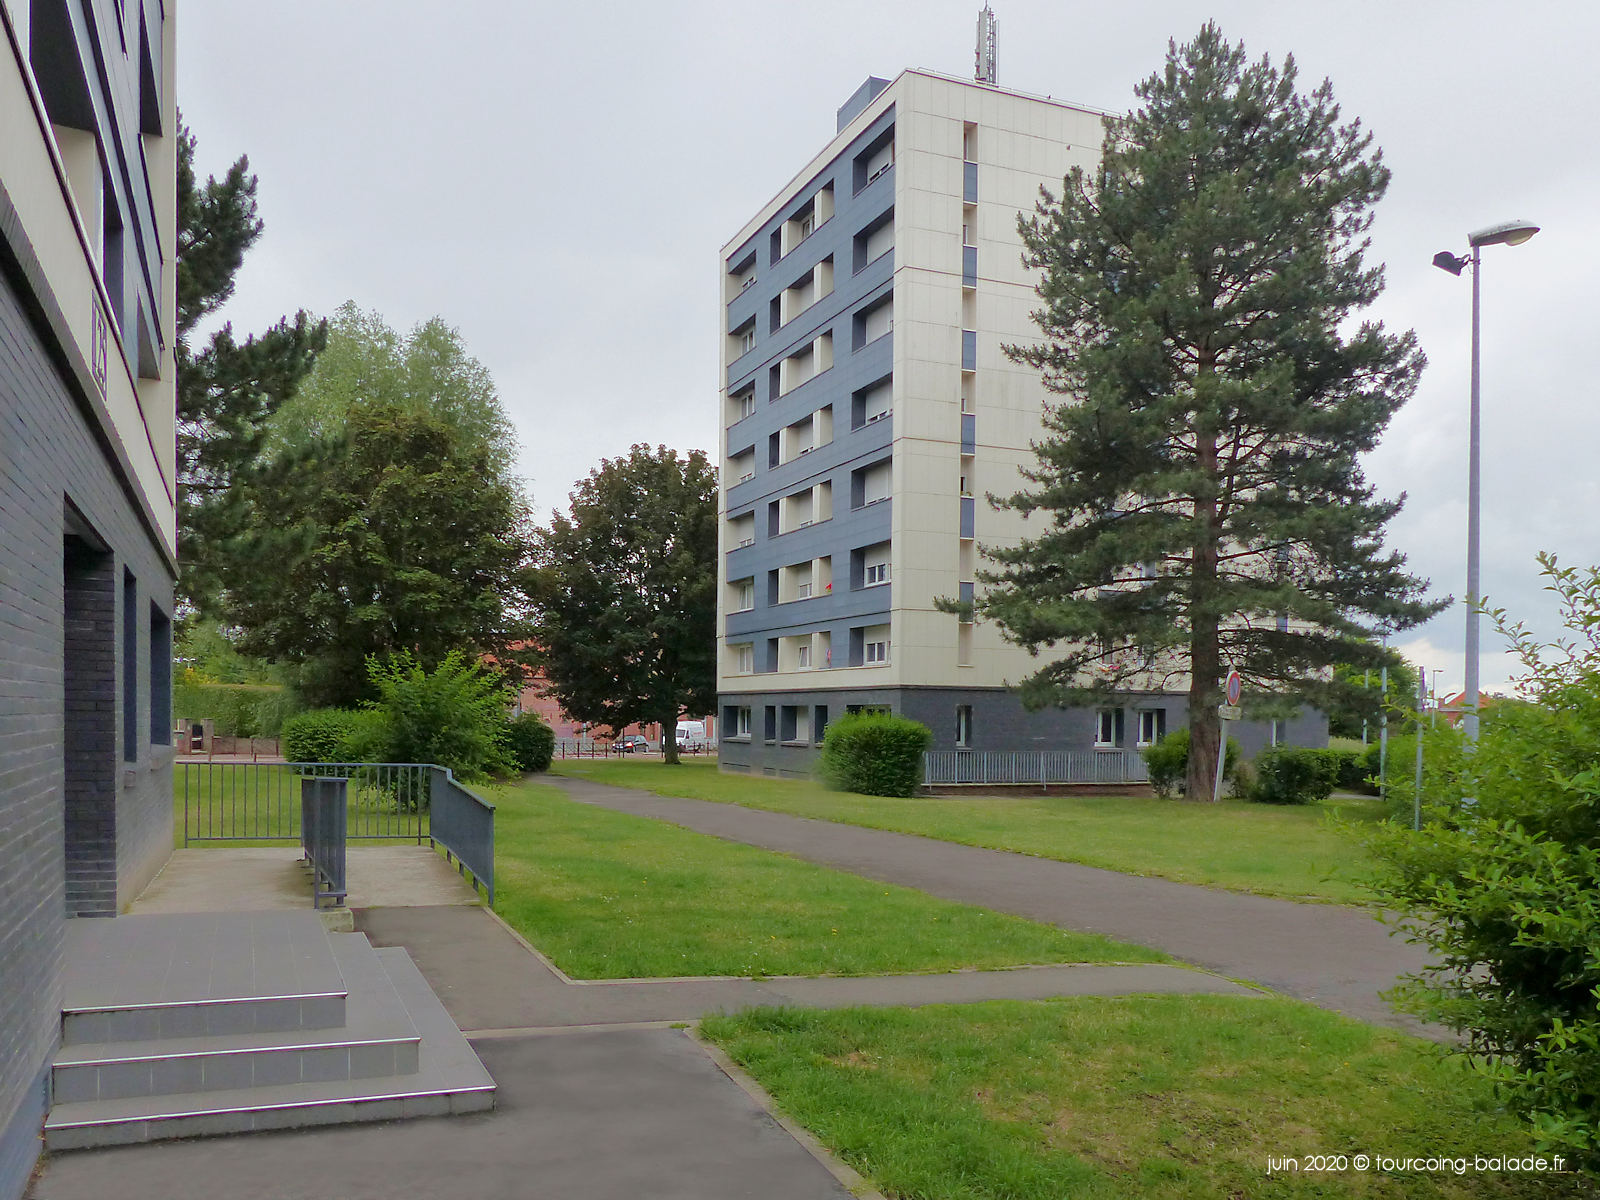 Résidence de l'Yser, Tourcoing